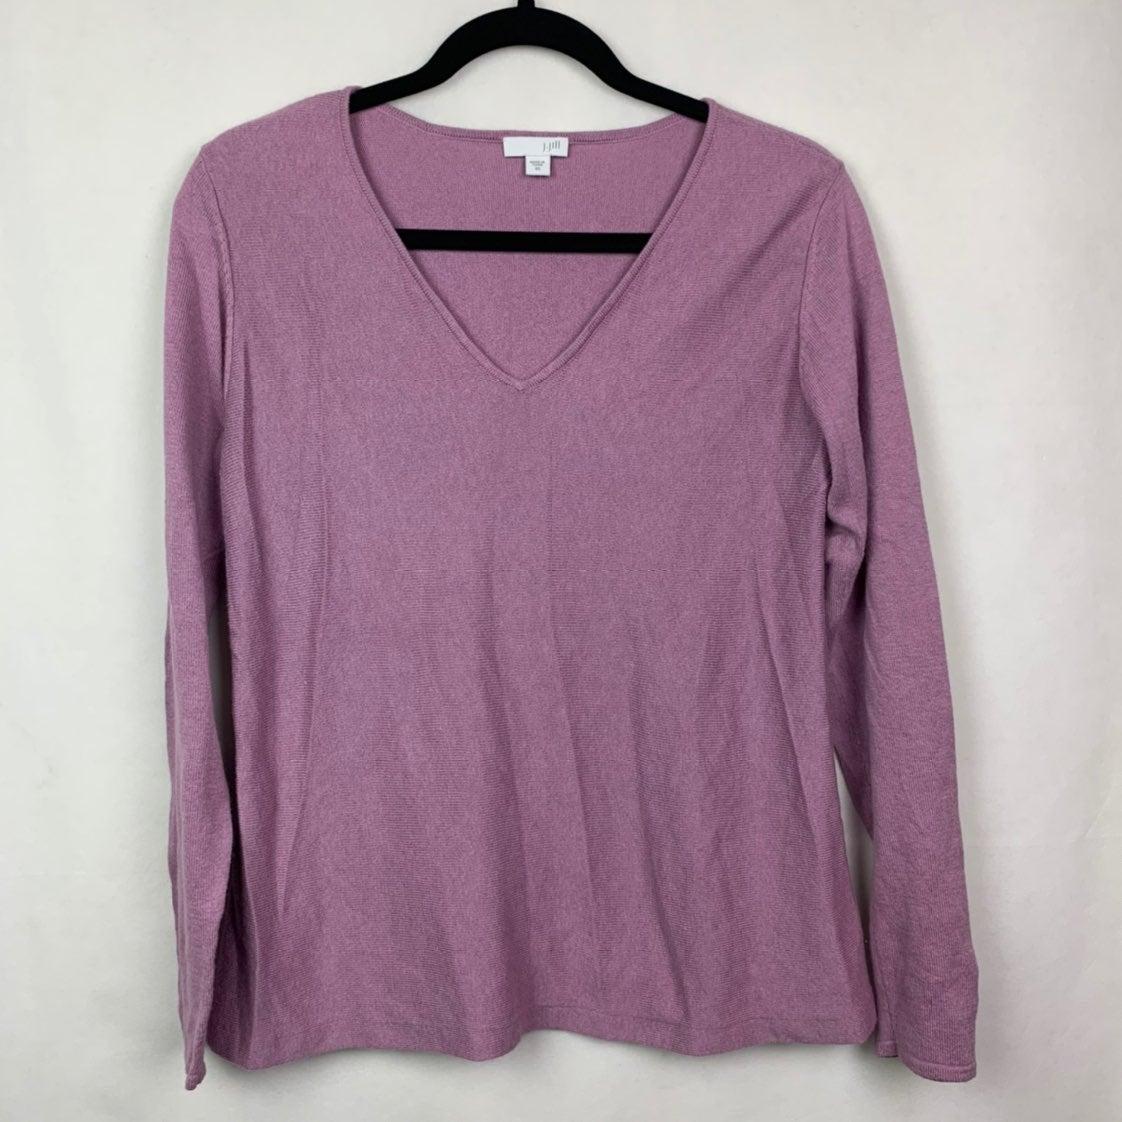 J. Jill V-Neck Wool Sweater Purple XS